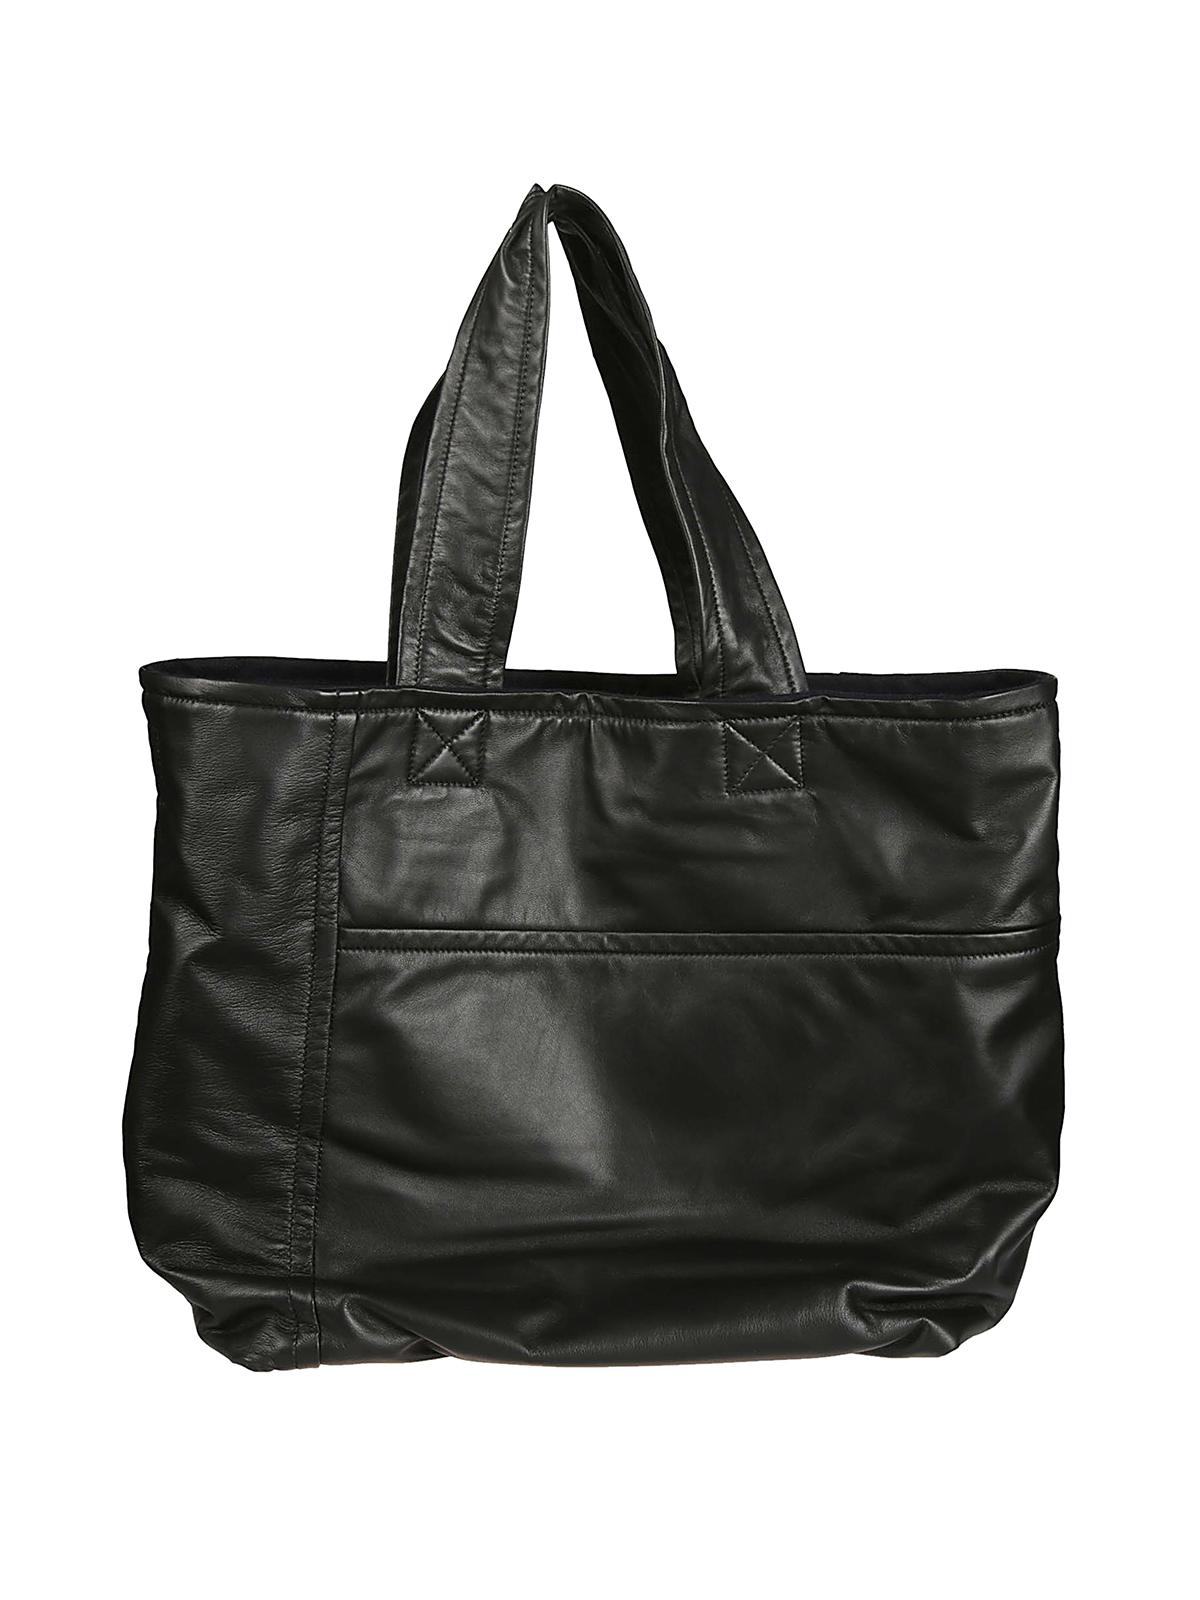 2261e89c3e4e iKRIX VICTORIA BECKHAM  totes bags - Sunday nappa leather slouchy bag